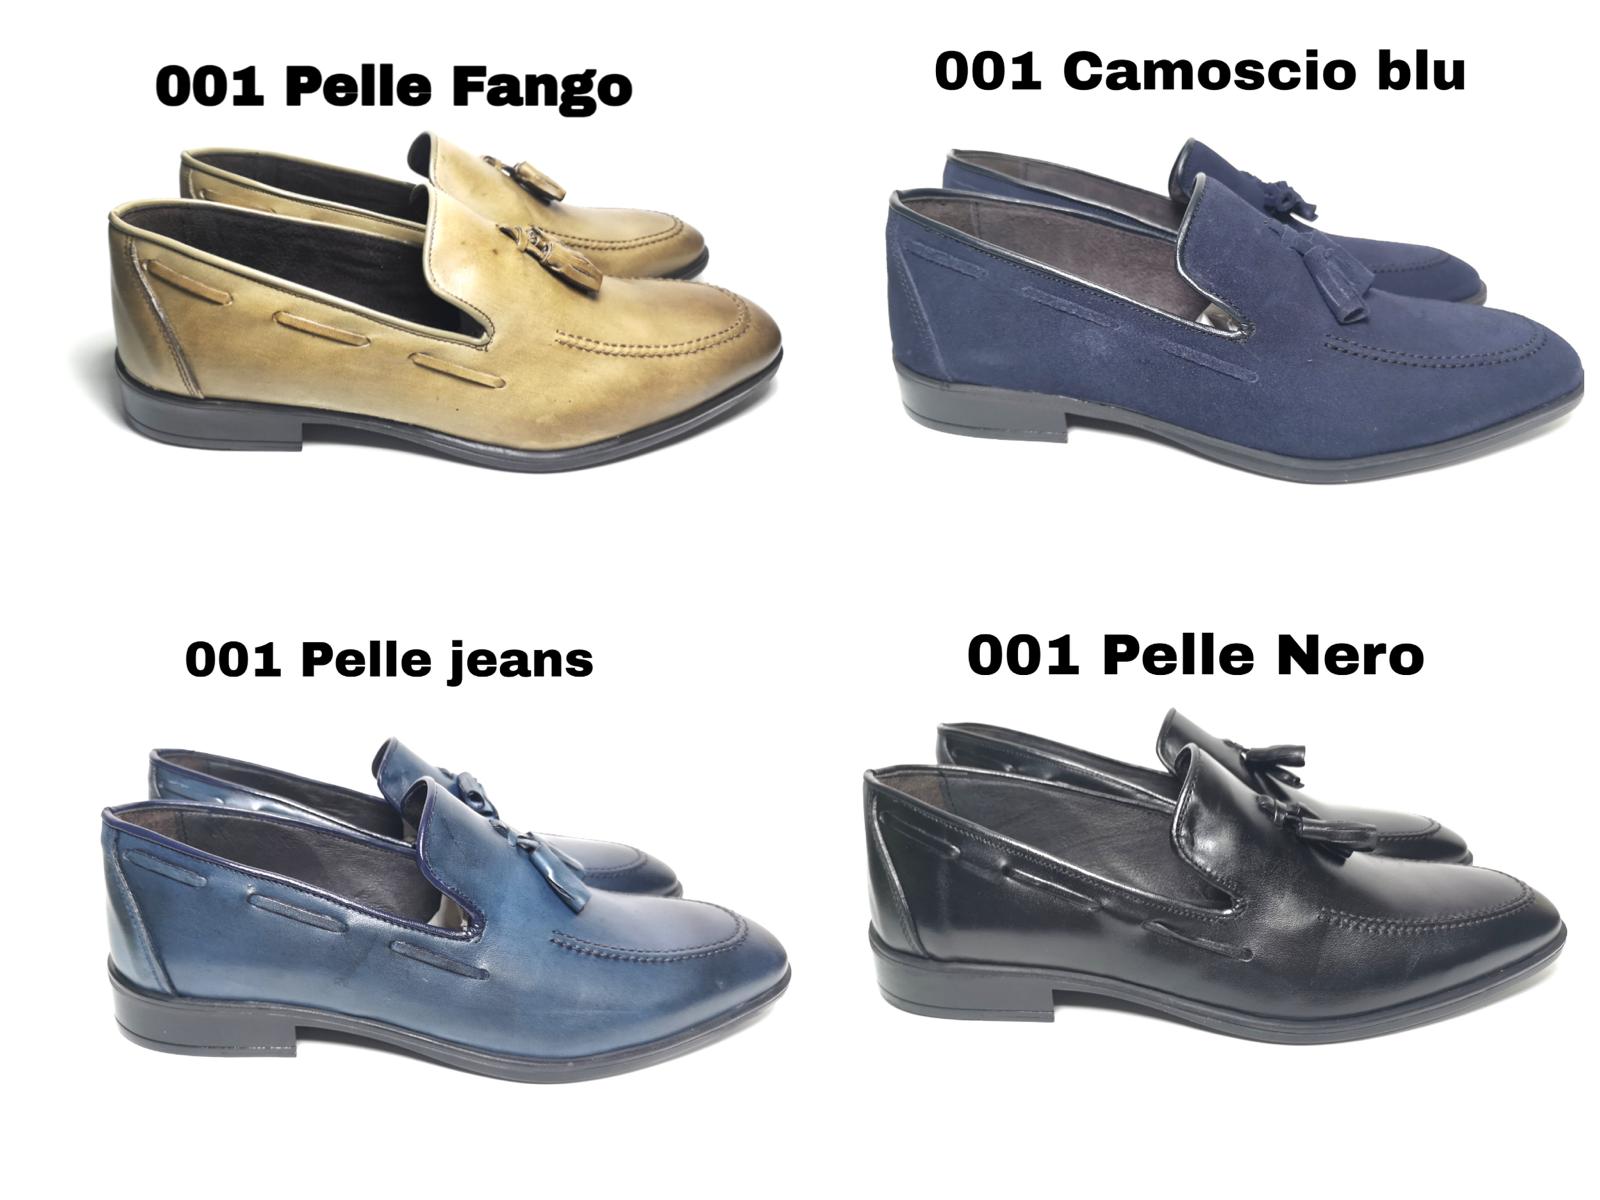 Details about Scarpe mocassini uomo Class blu scuro eleganti man's shoes calzature in ecopelle